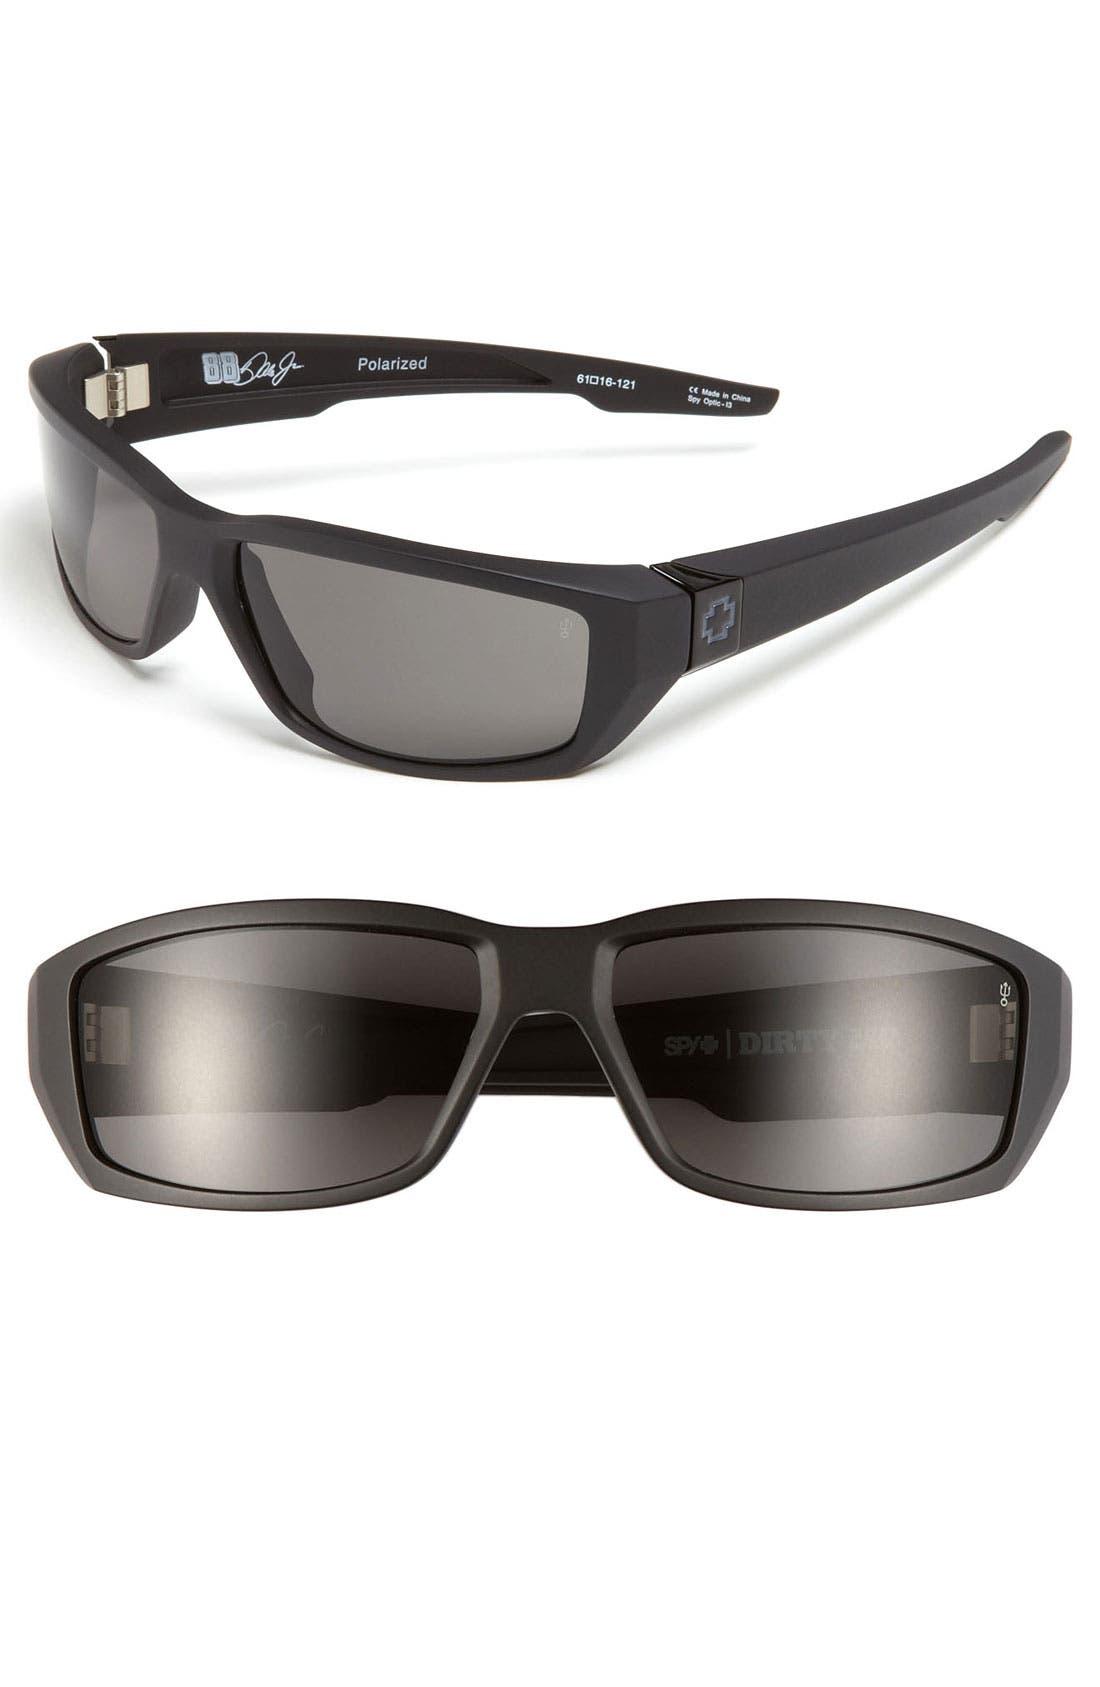 Main Image - SPY Optic 'Dale Earnhardt Jr. - Dirty Mo' 59mm Polarized Sunglasses